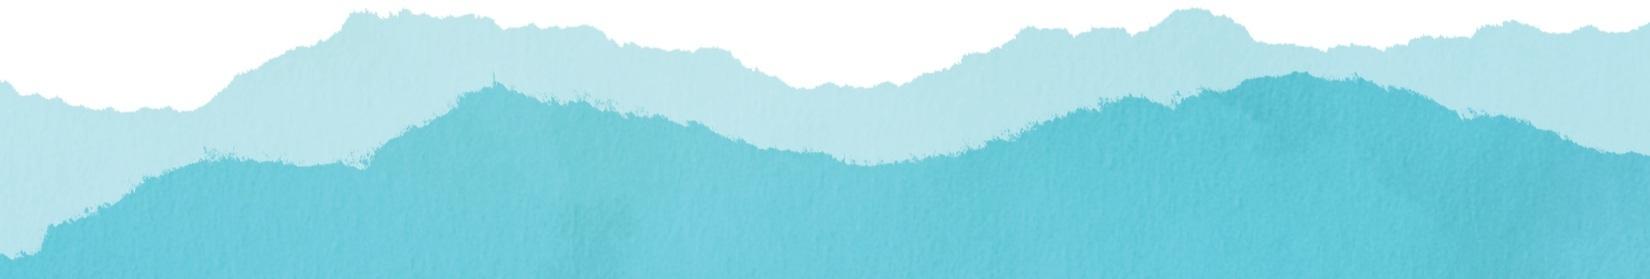 Tear-graphic-horizontal.jpg